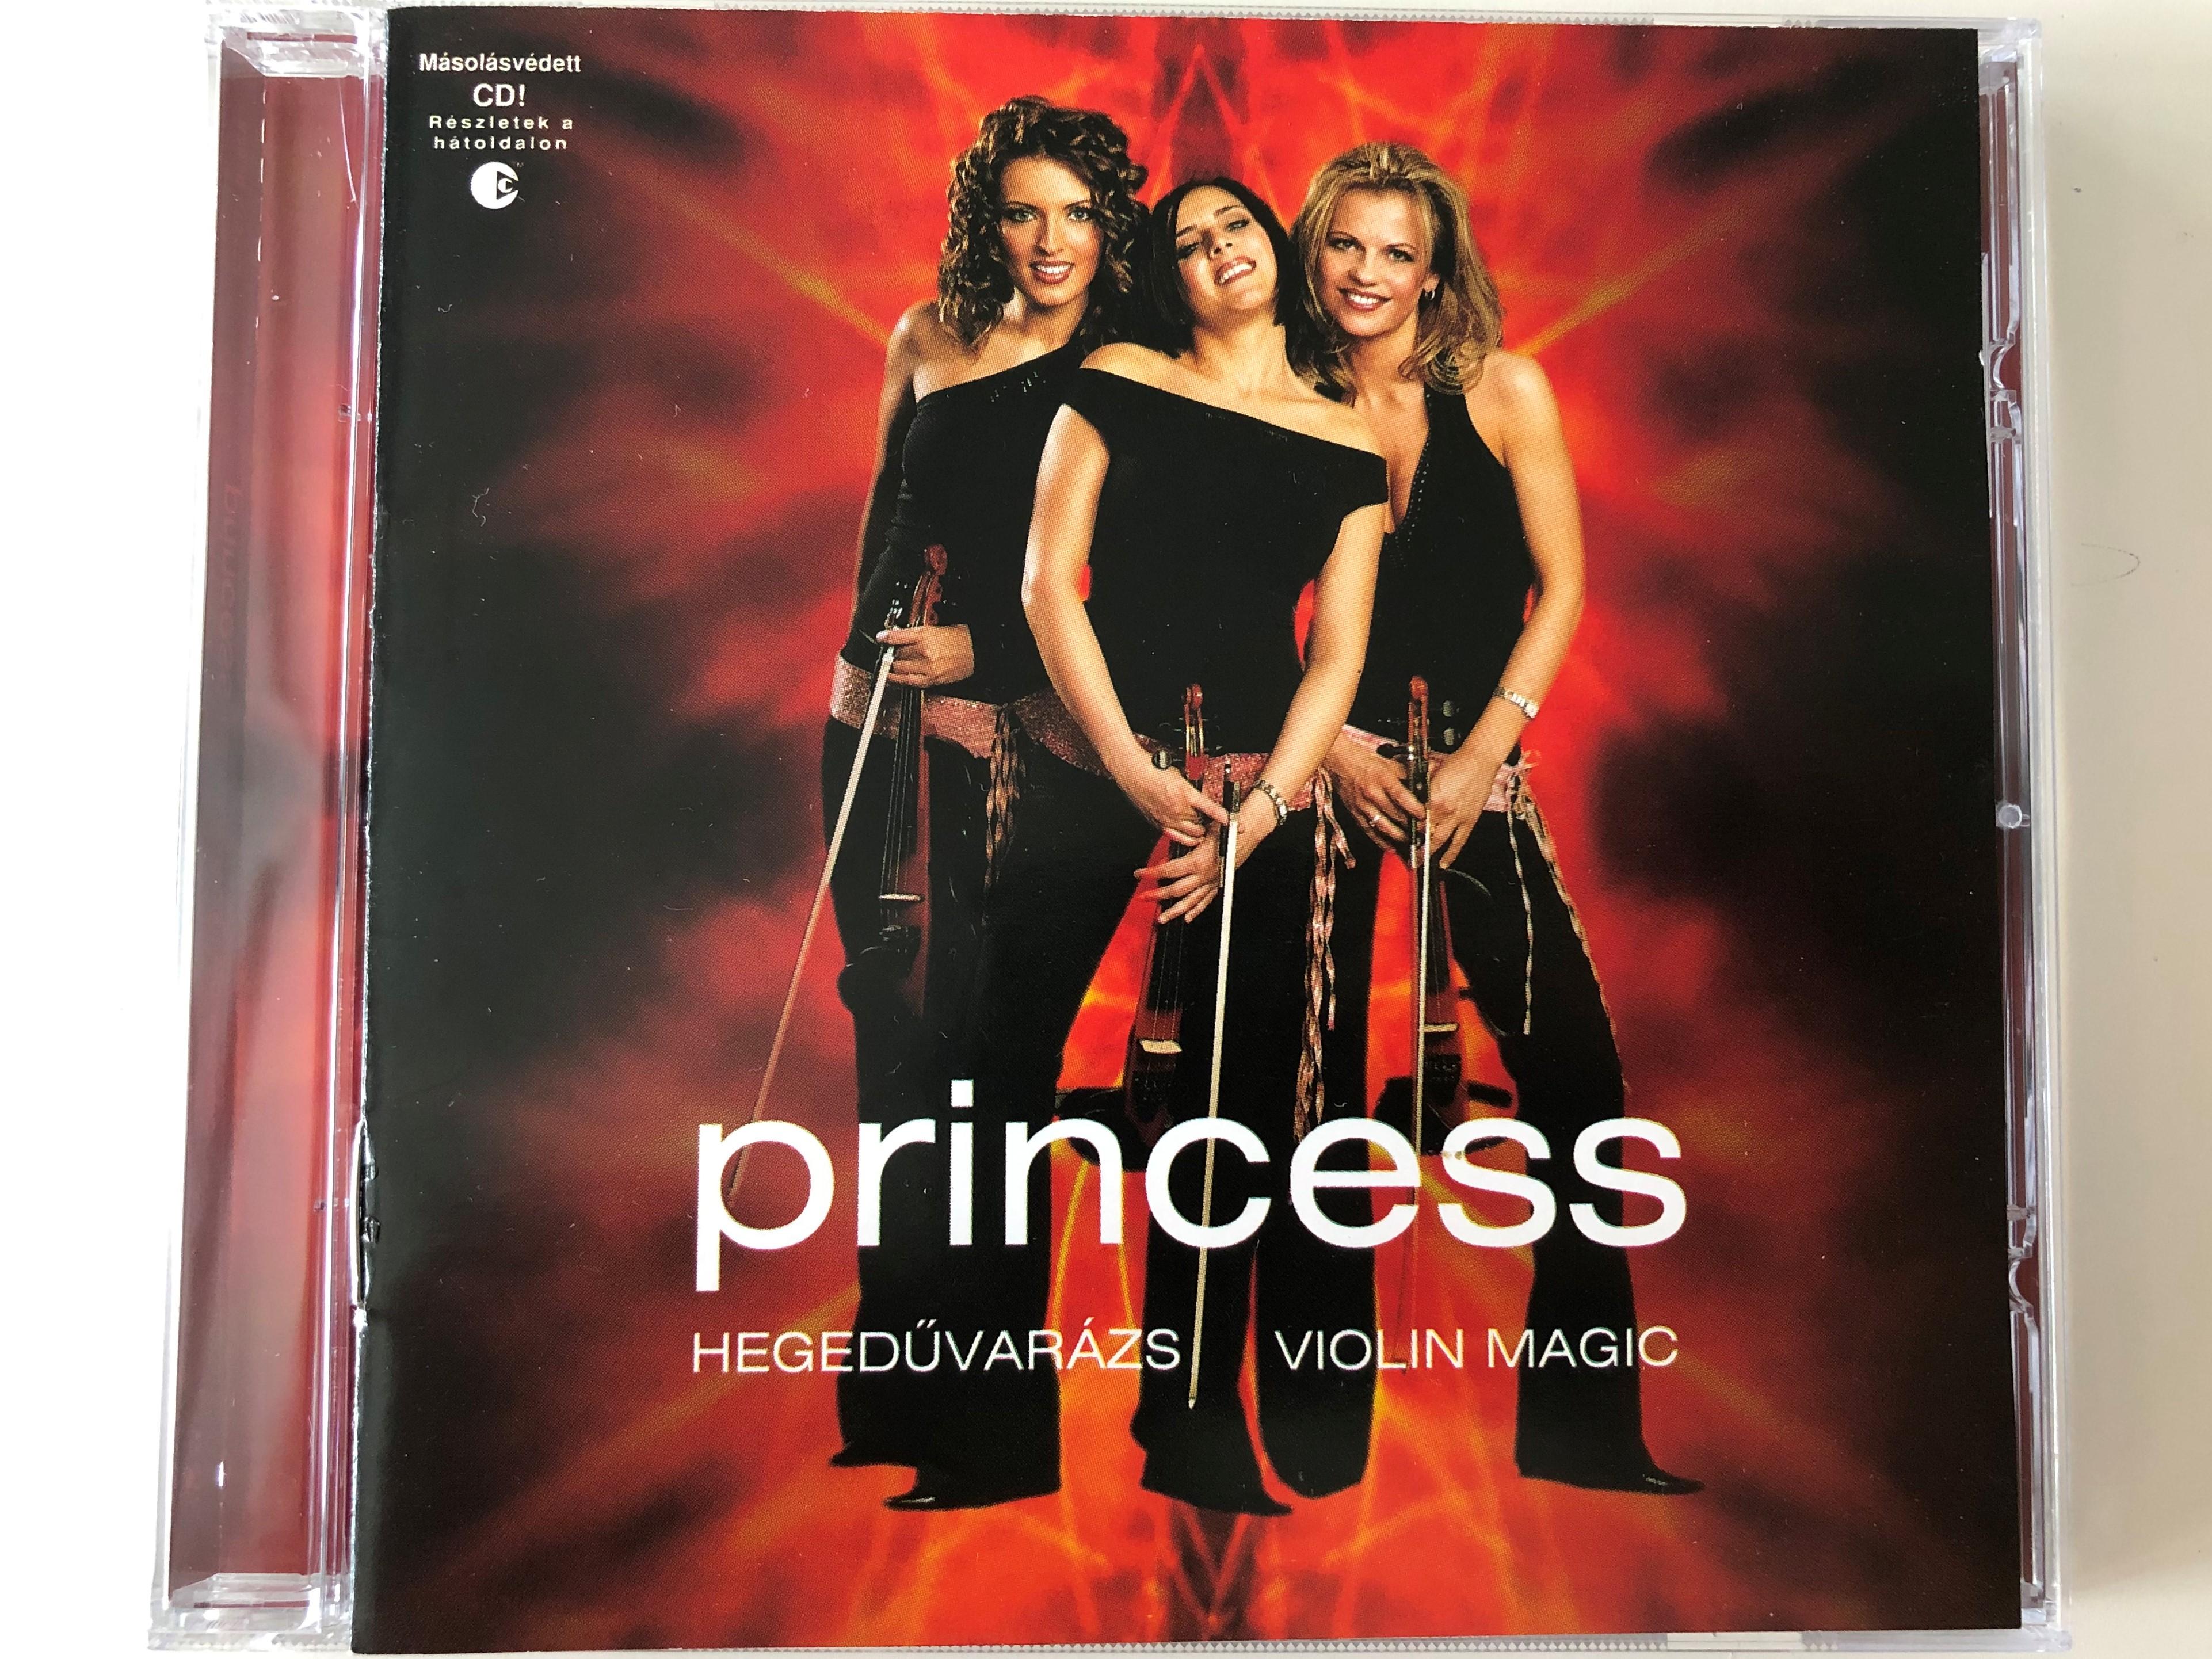 princess-heged-var-zs-violin-magic-bmg-hungary-audio-cd-2003-82876-515172-1-.jpg